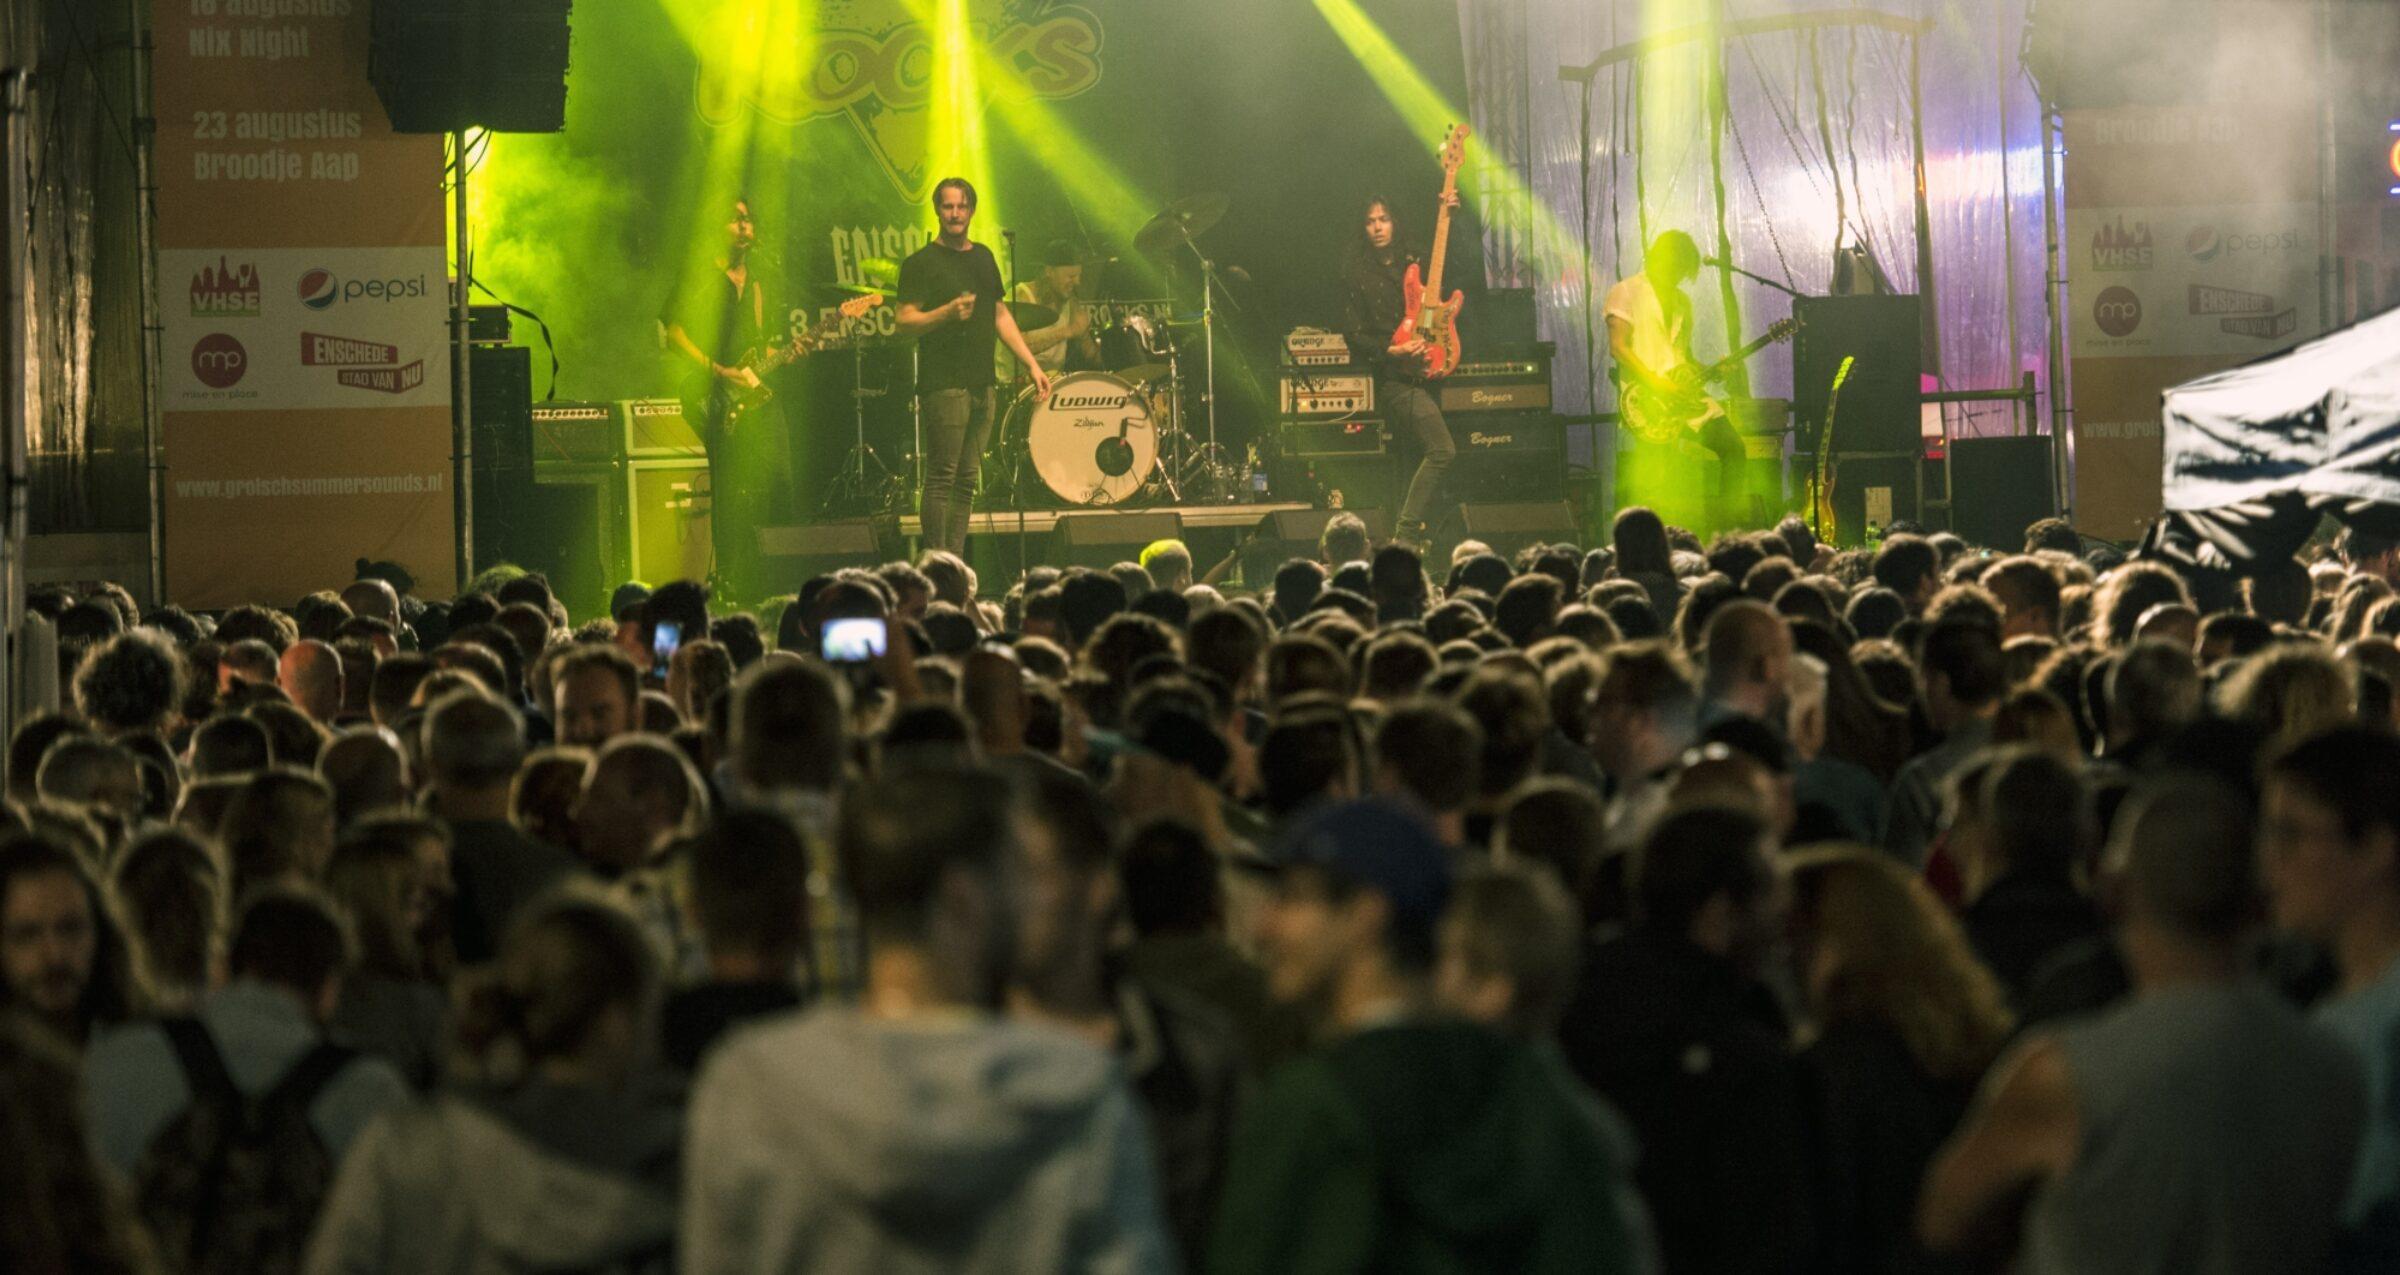 2018 Roy Te Lintelo Grolsch Summer Sounds Enschede Rocks evenementen 24 2548 1553862651 35hxemw9x8